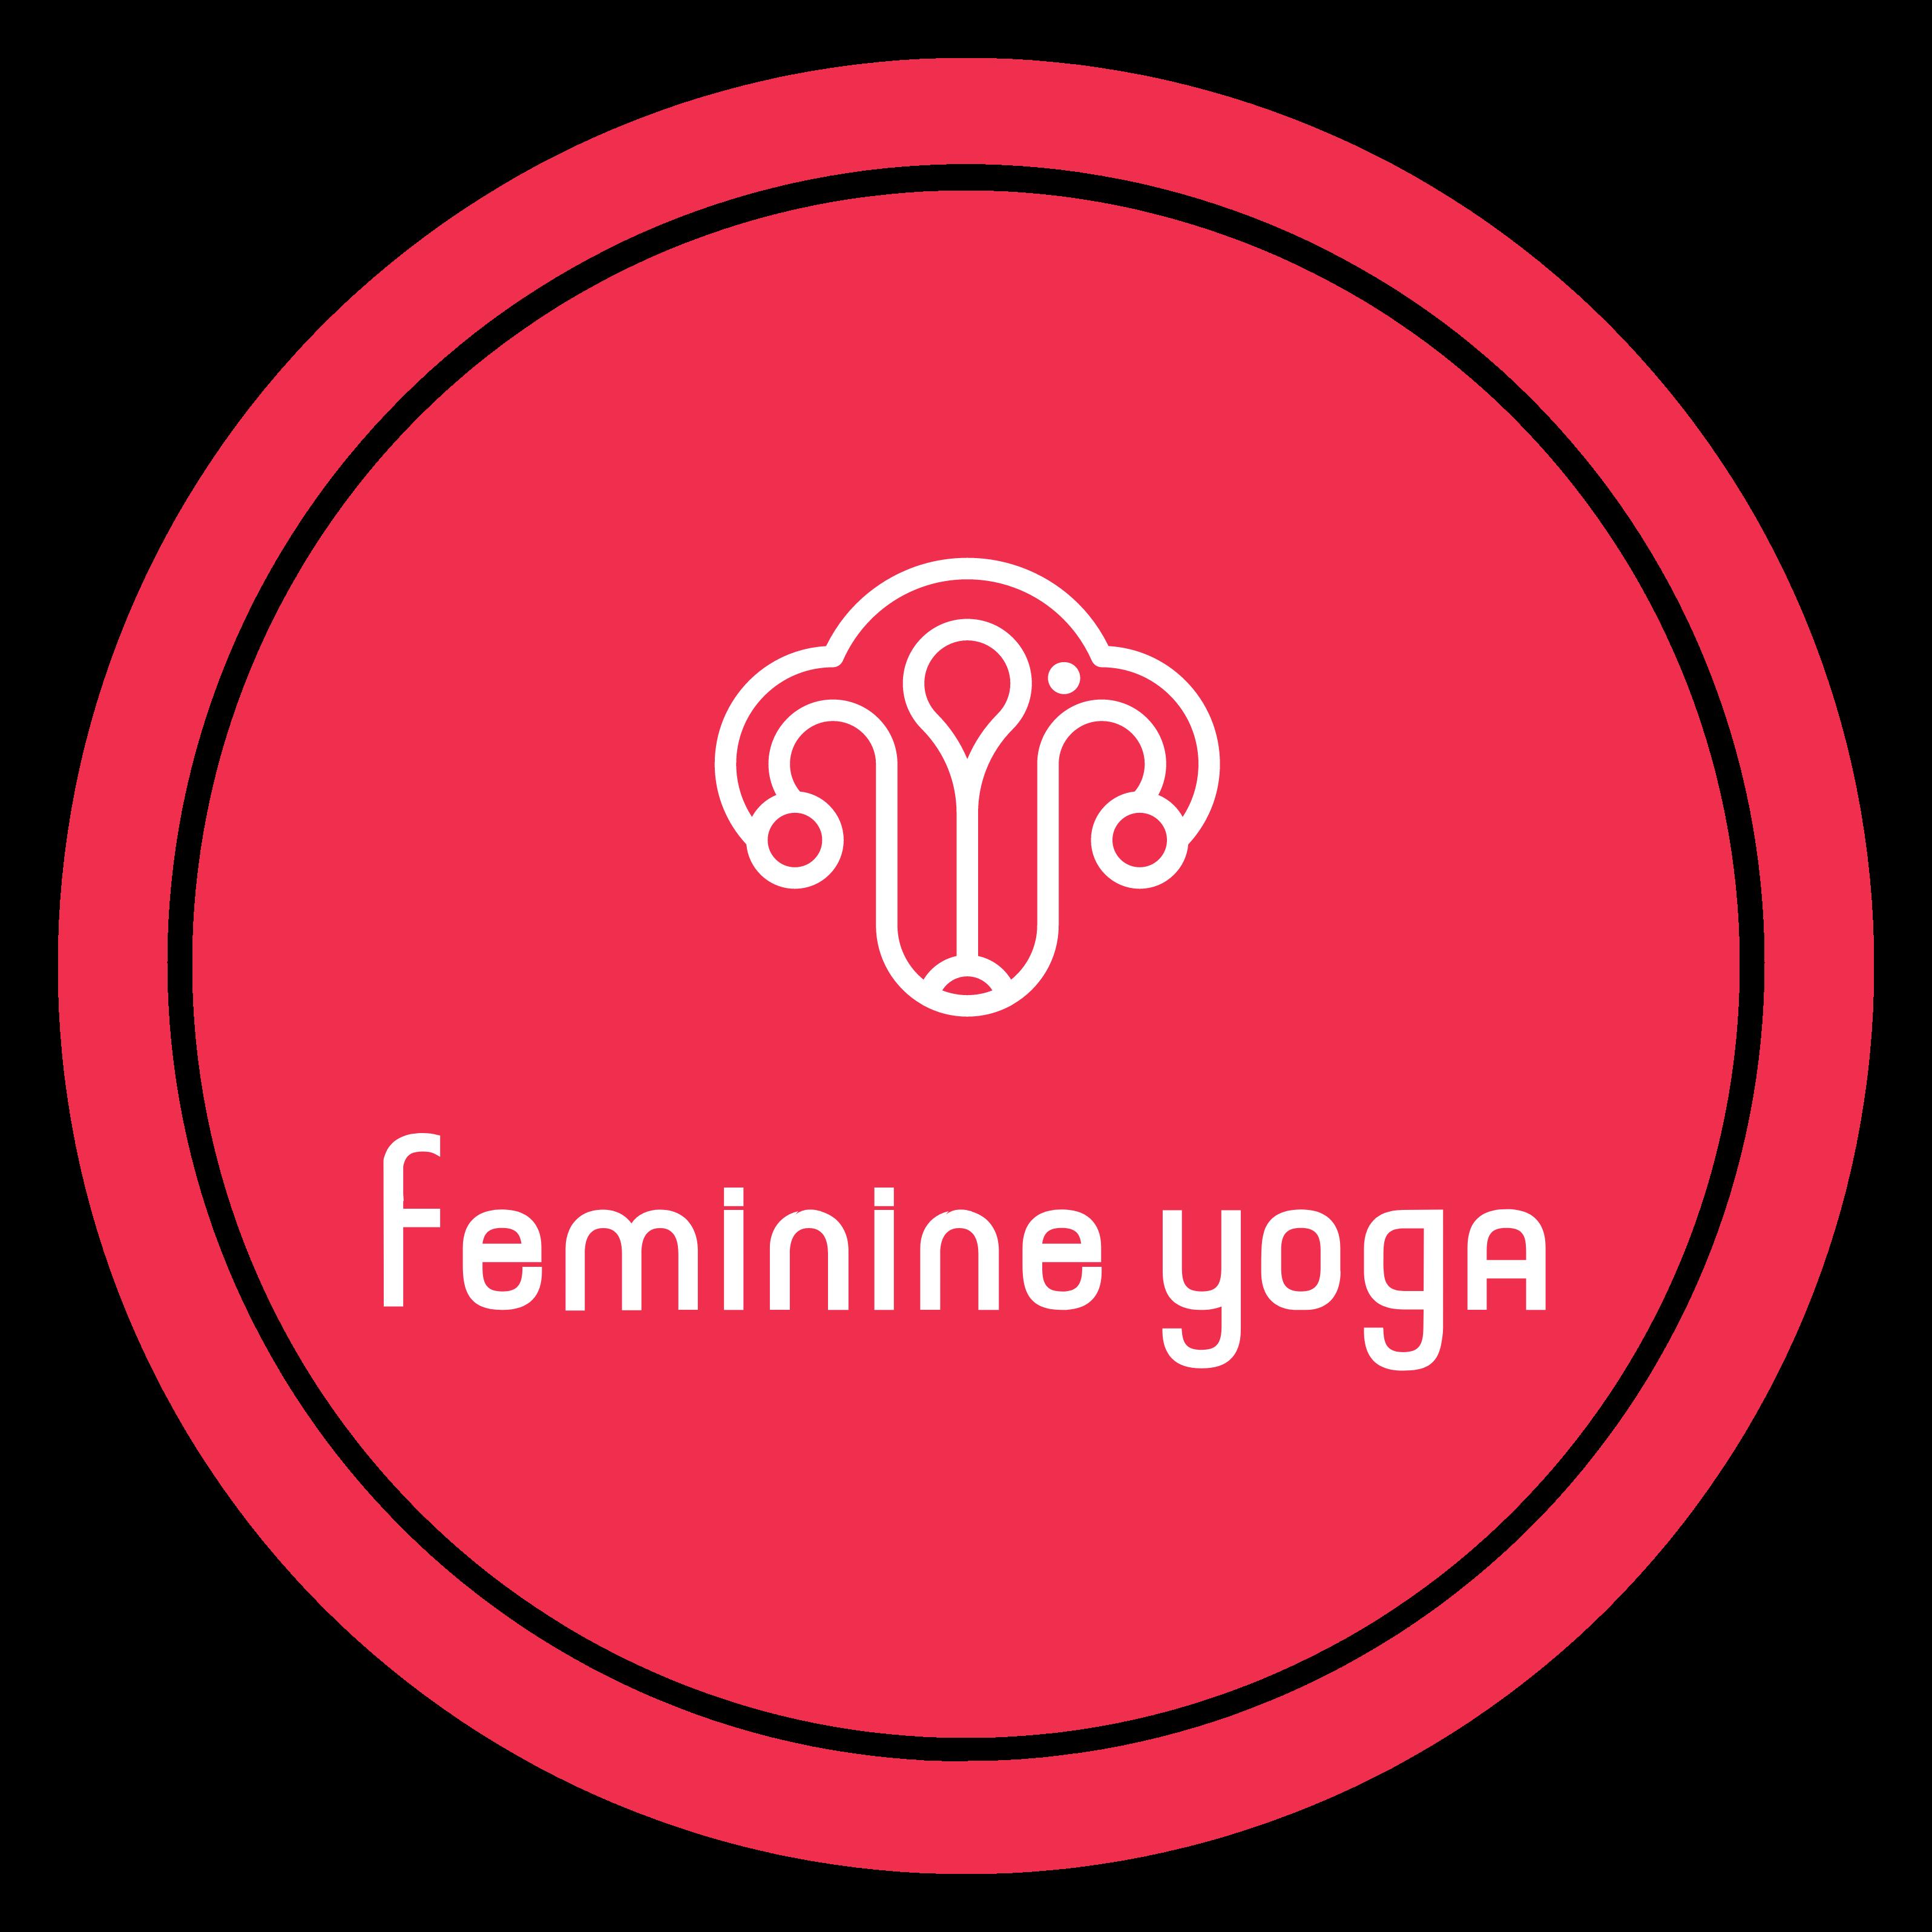 Logo feminine.yoga